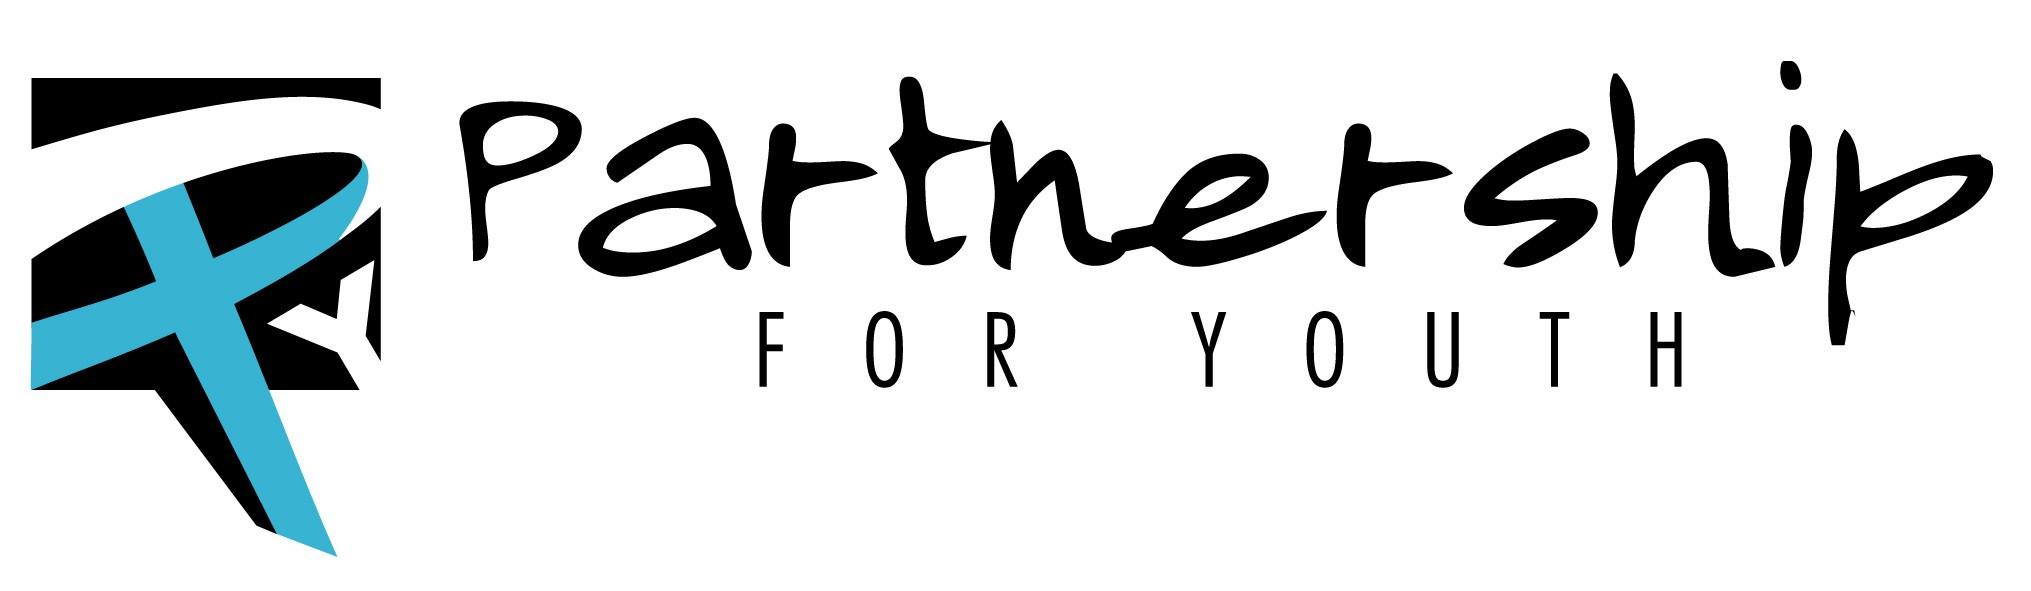 Partnership for Youth logo